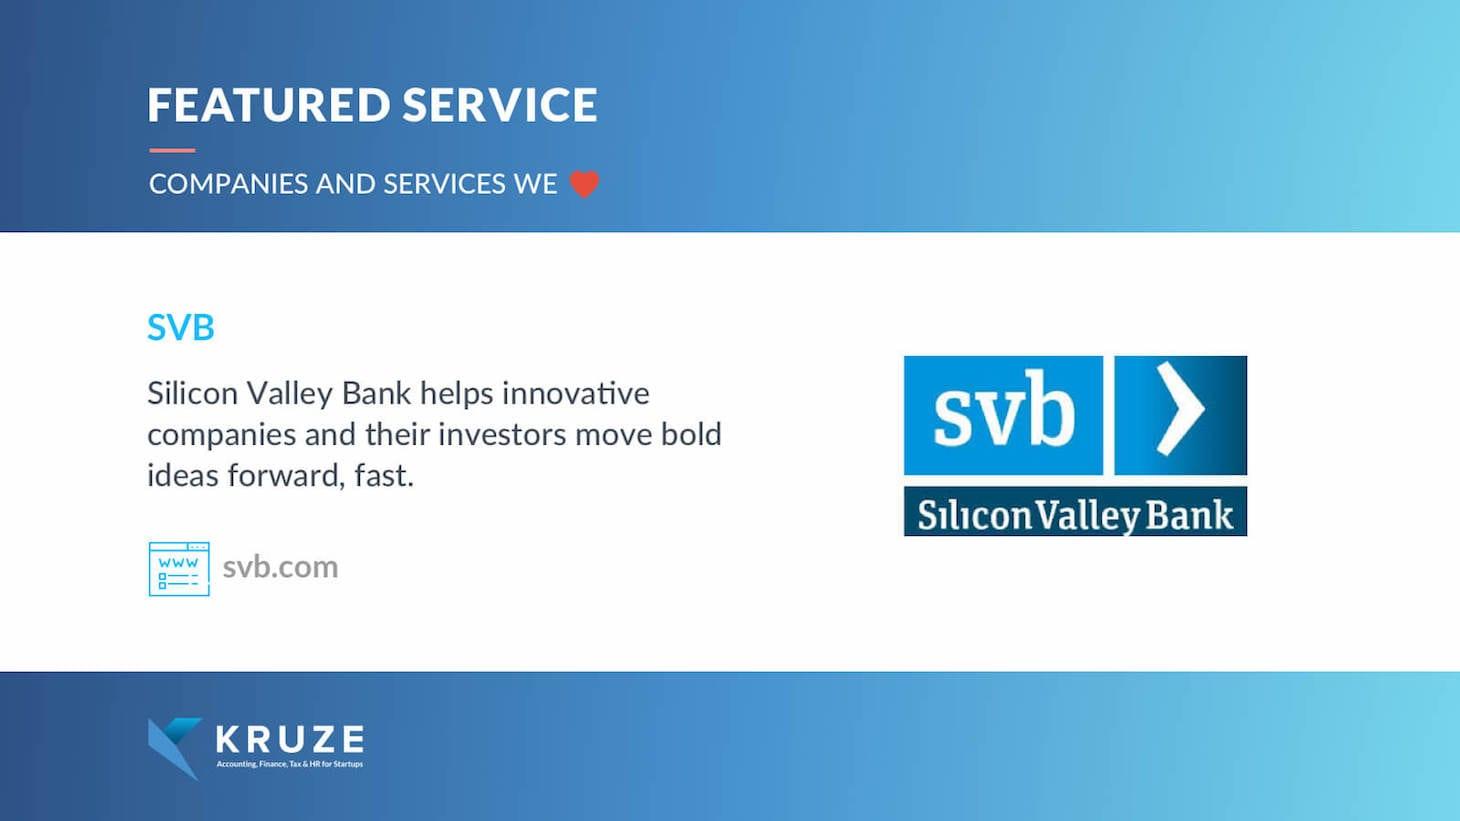 Featured Service - SVB